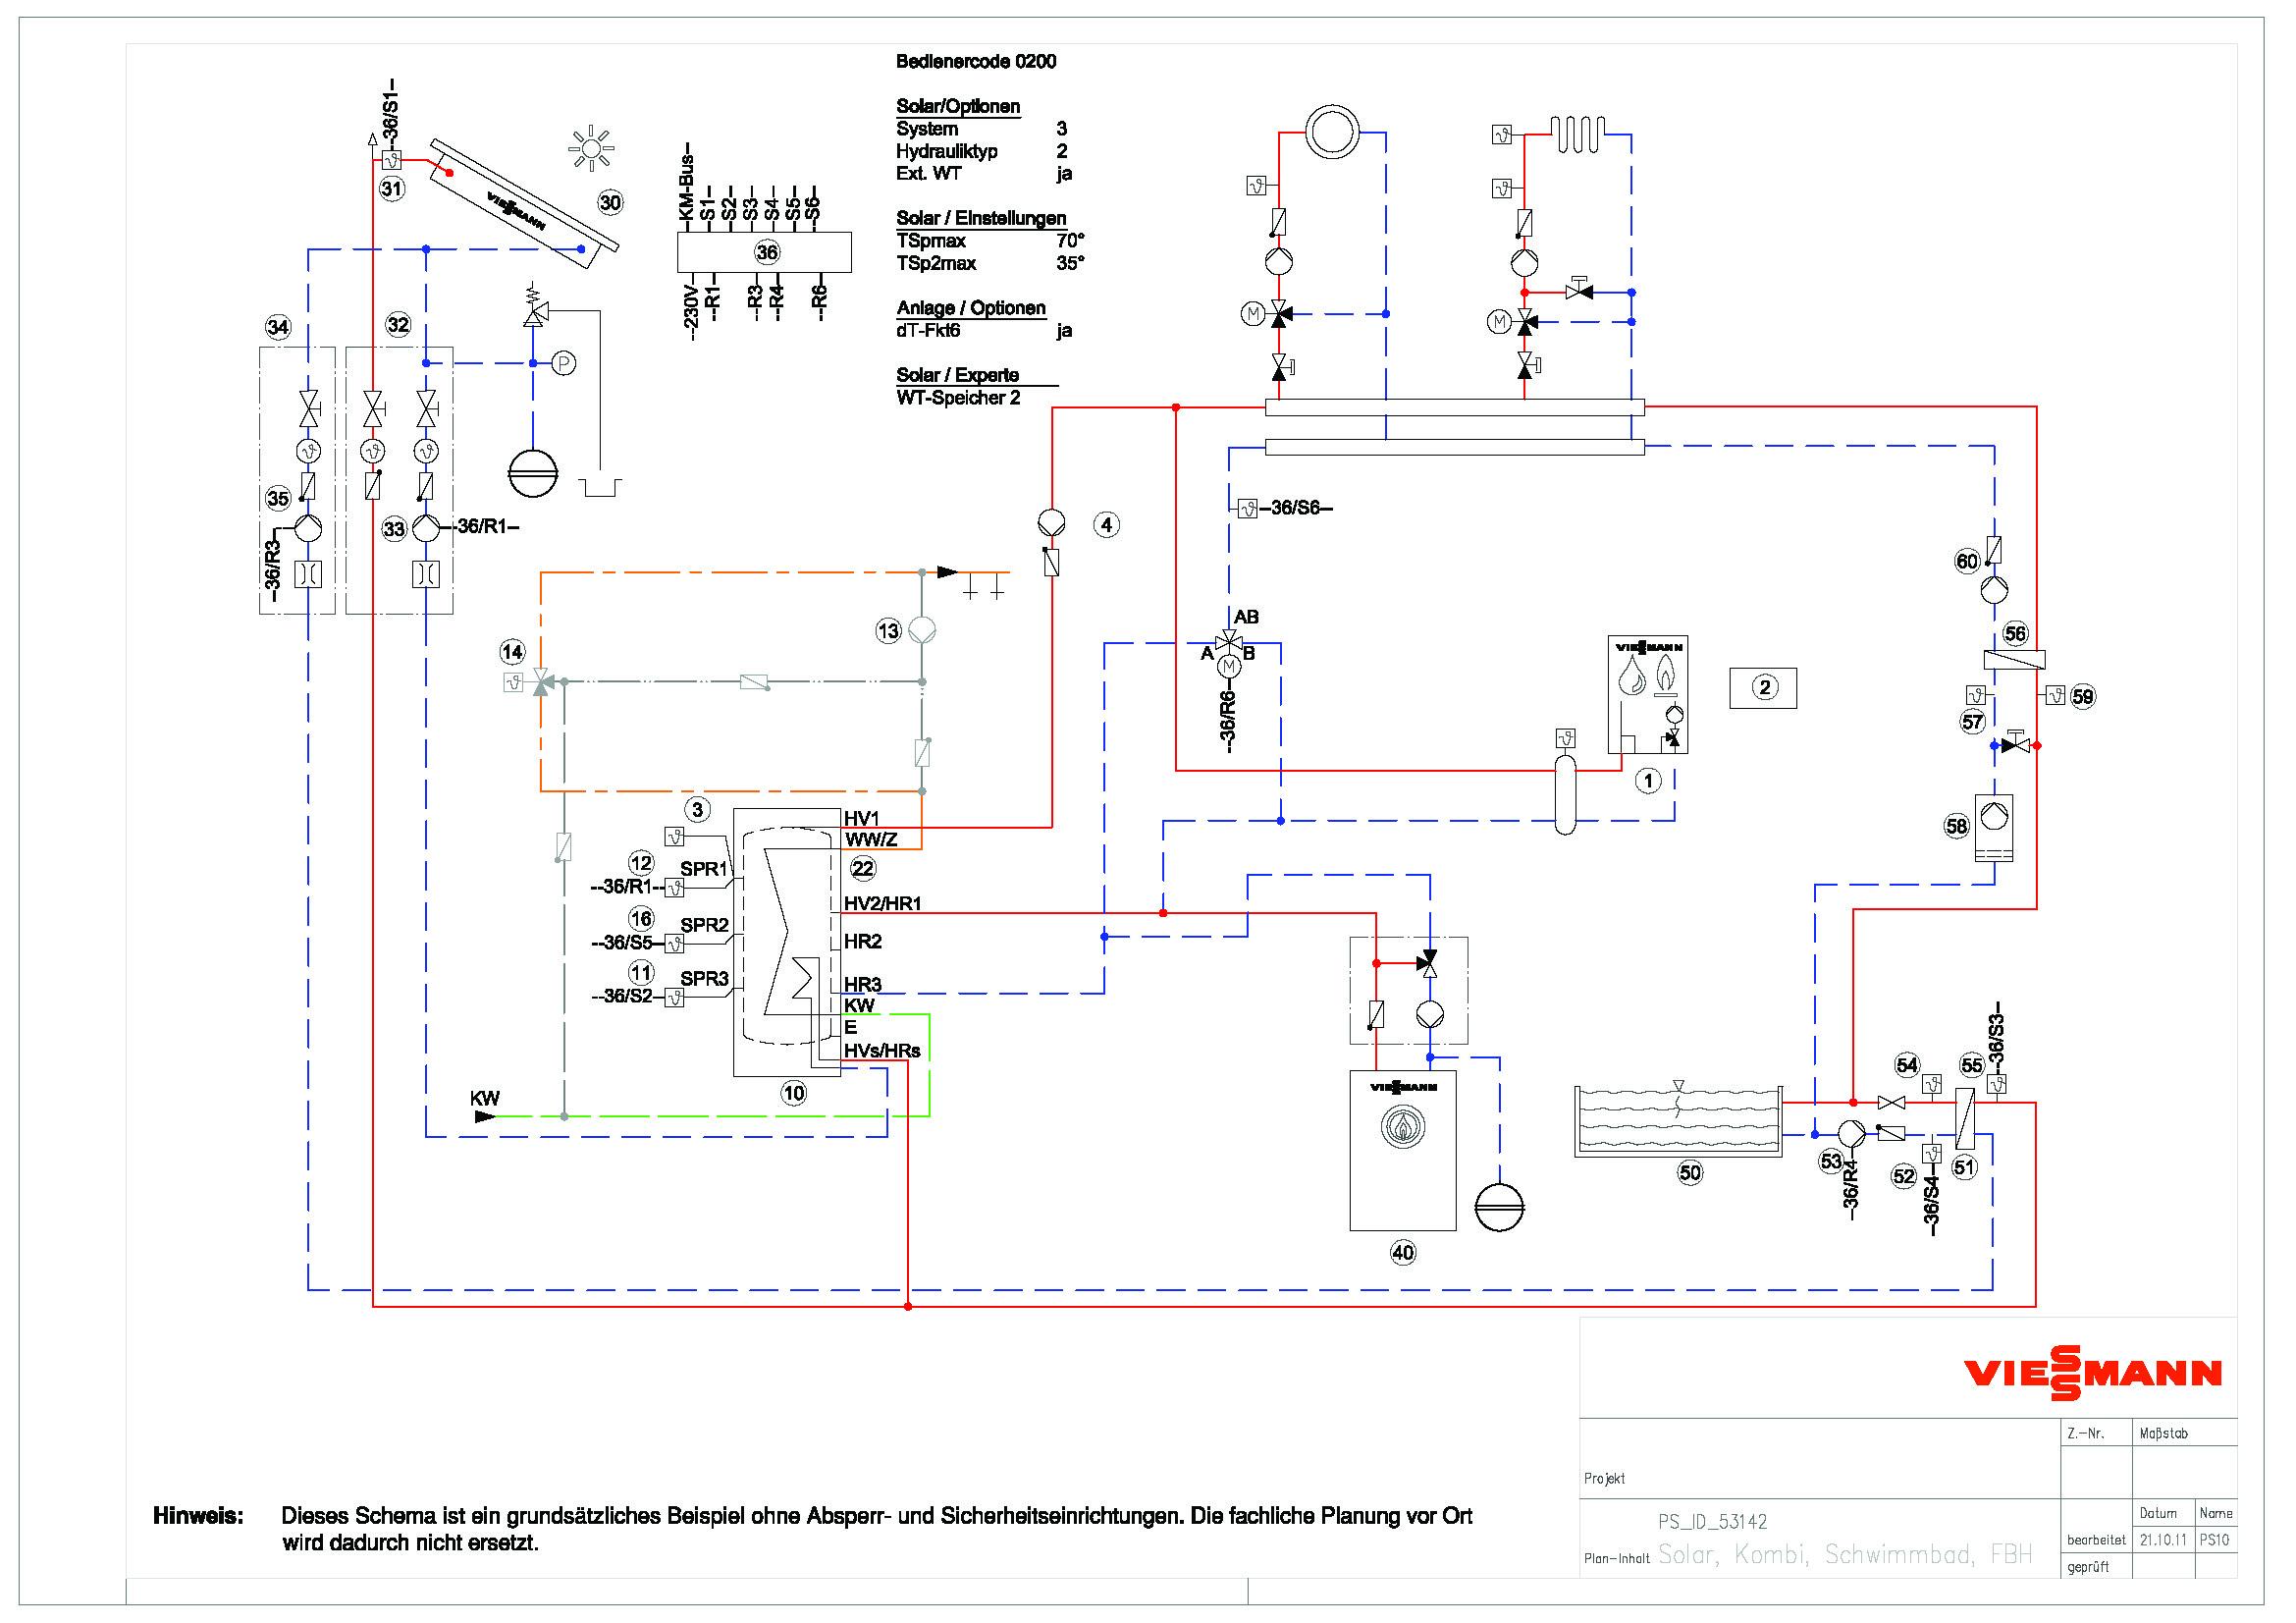 hydraulikschema viessmann die 2te haustechnikdialog. Black Bedroom Furniture Sets. Home Design Ideas